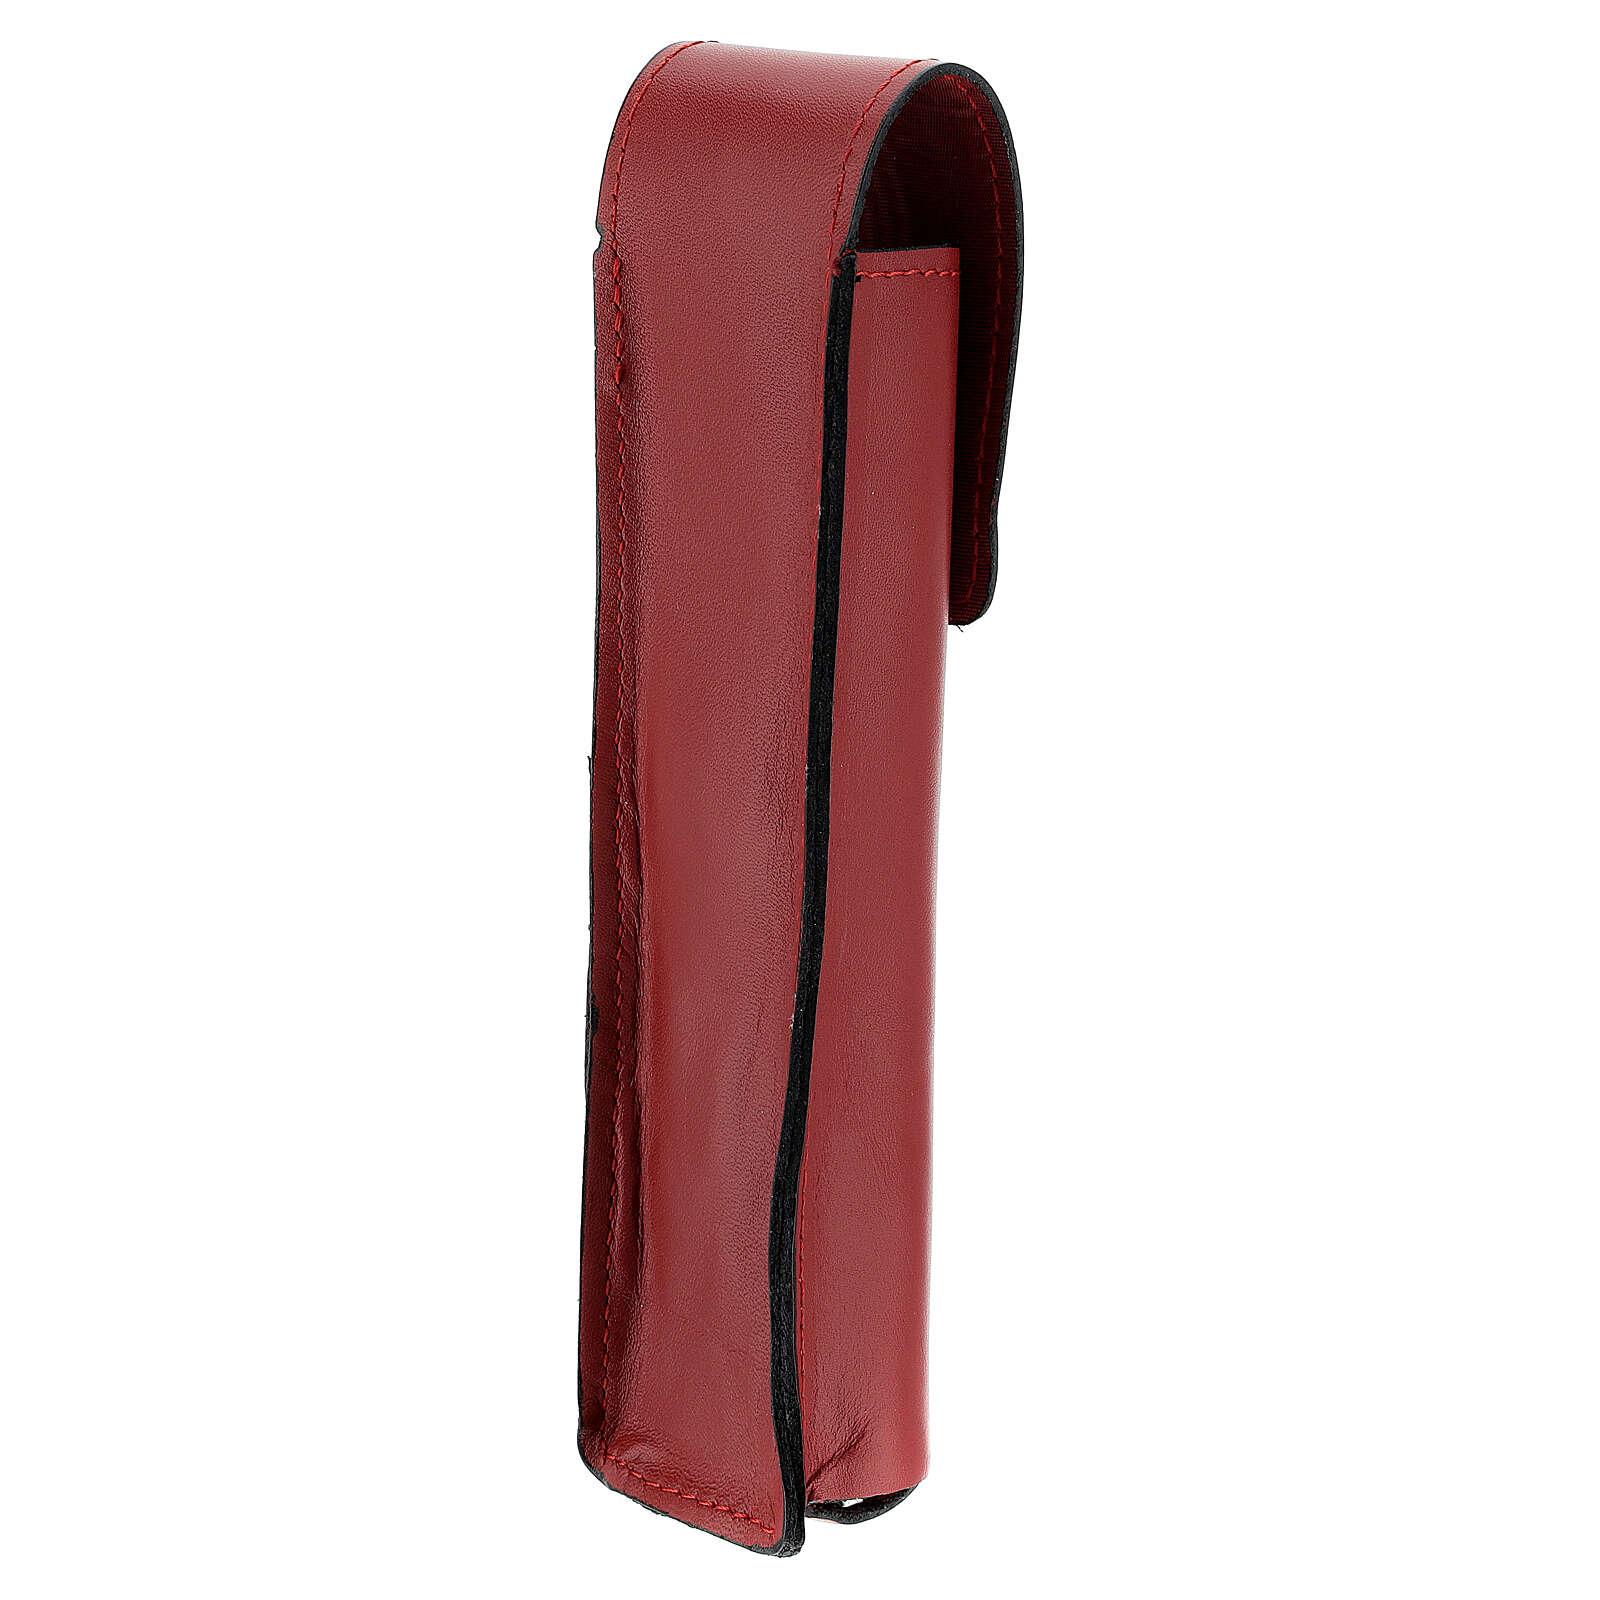 Sprinkler case 7 in real red leather 3